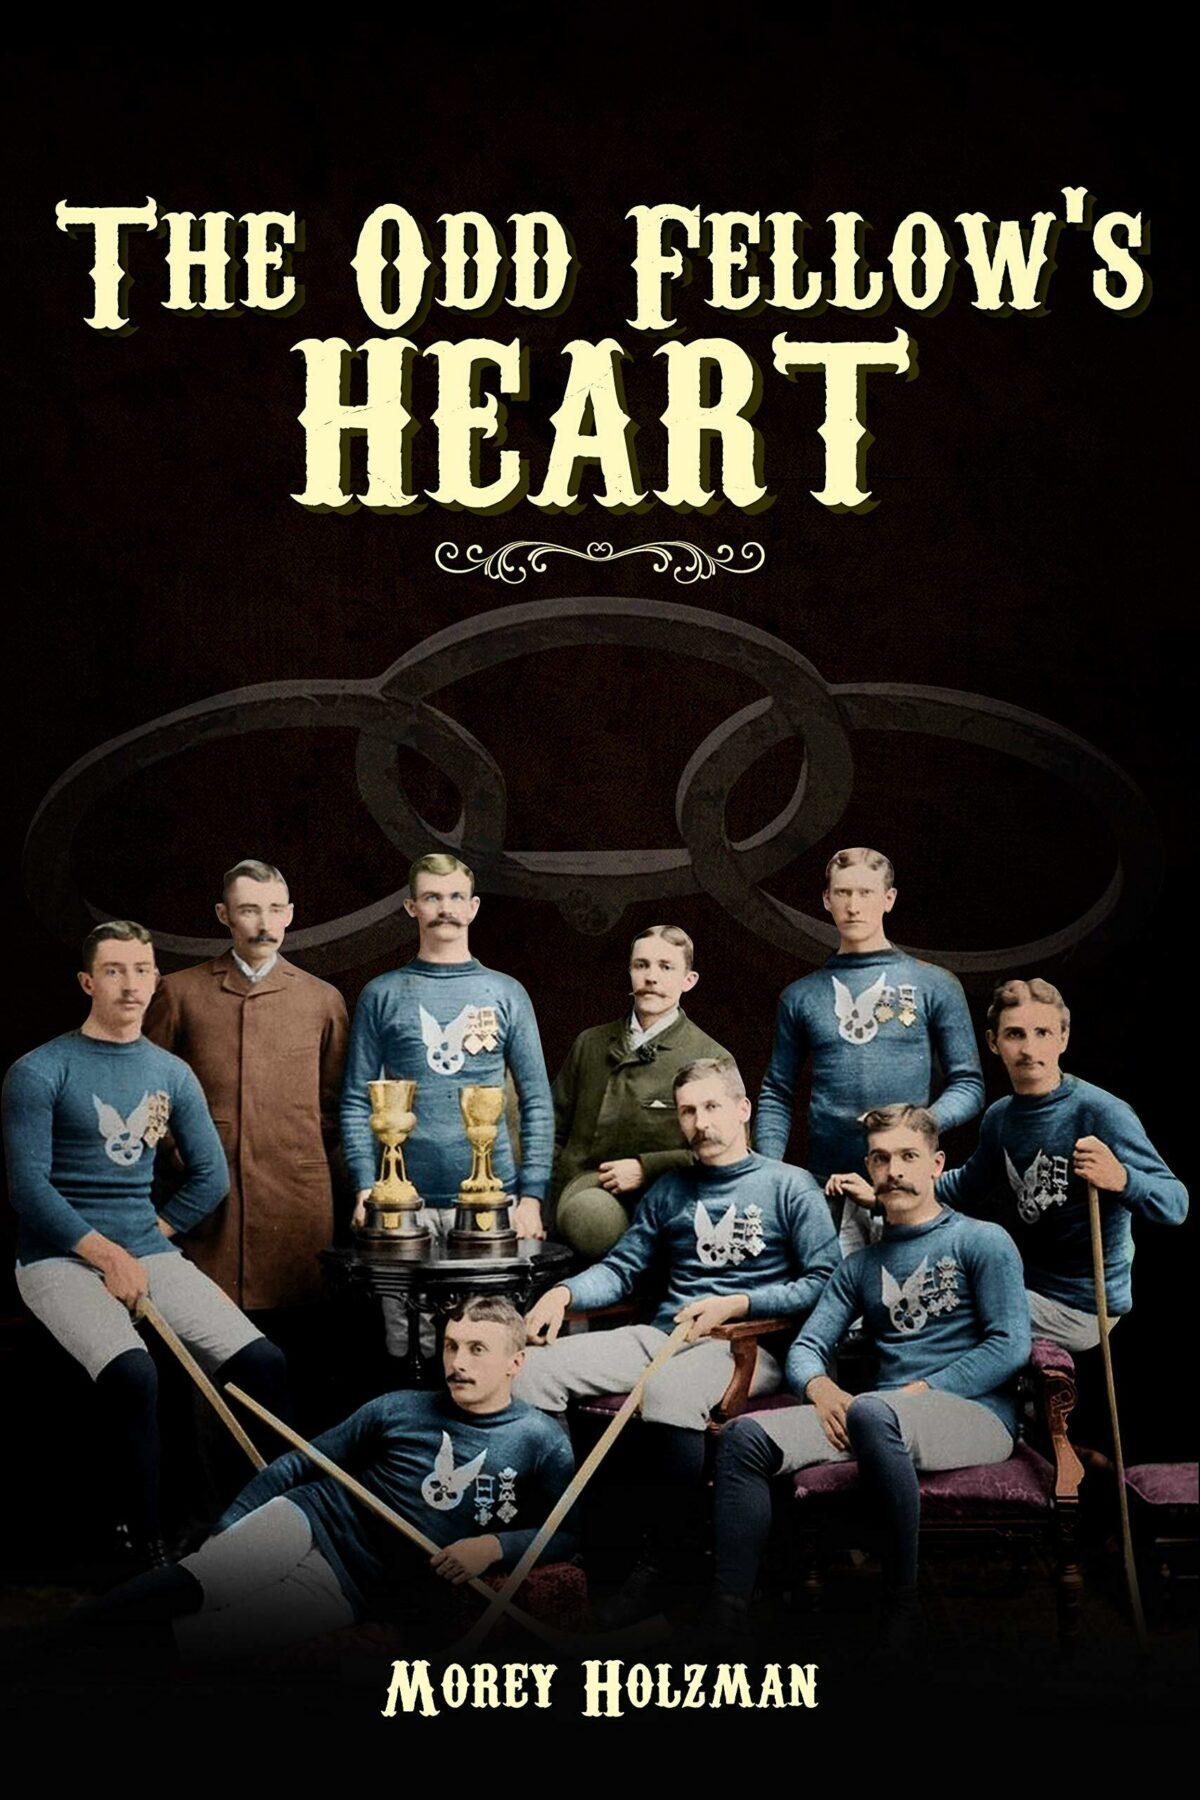 The Odd Fellow's Heart book cover